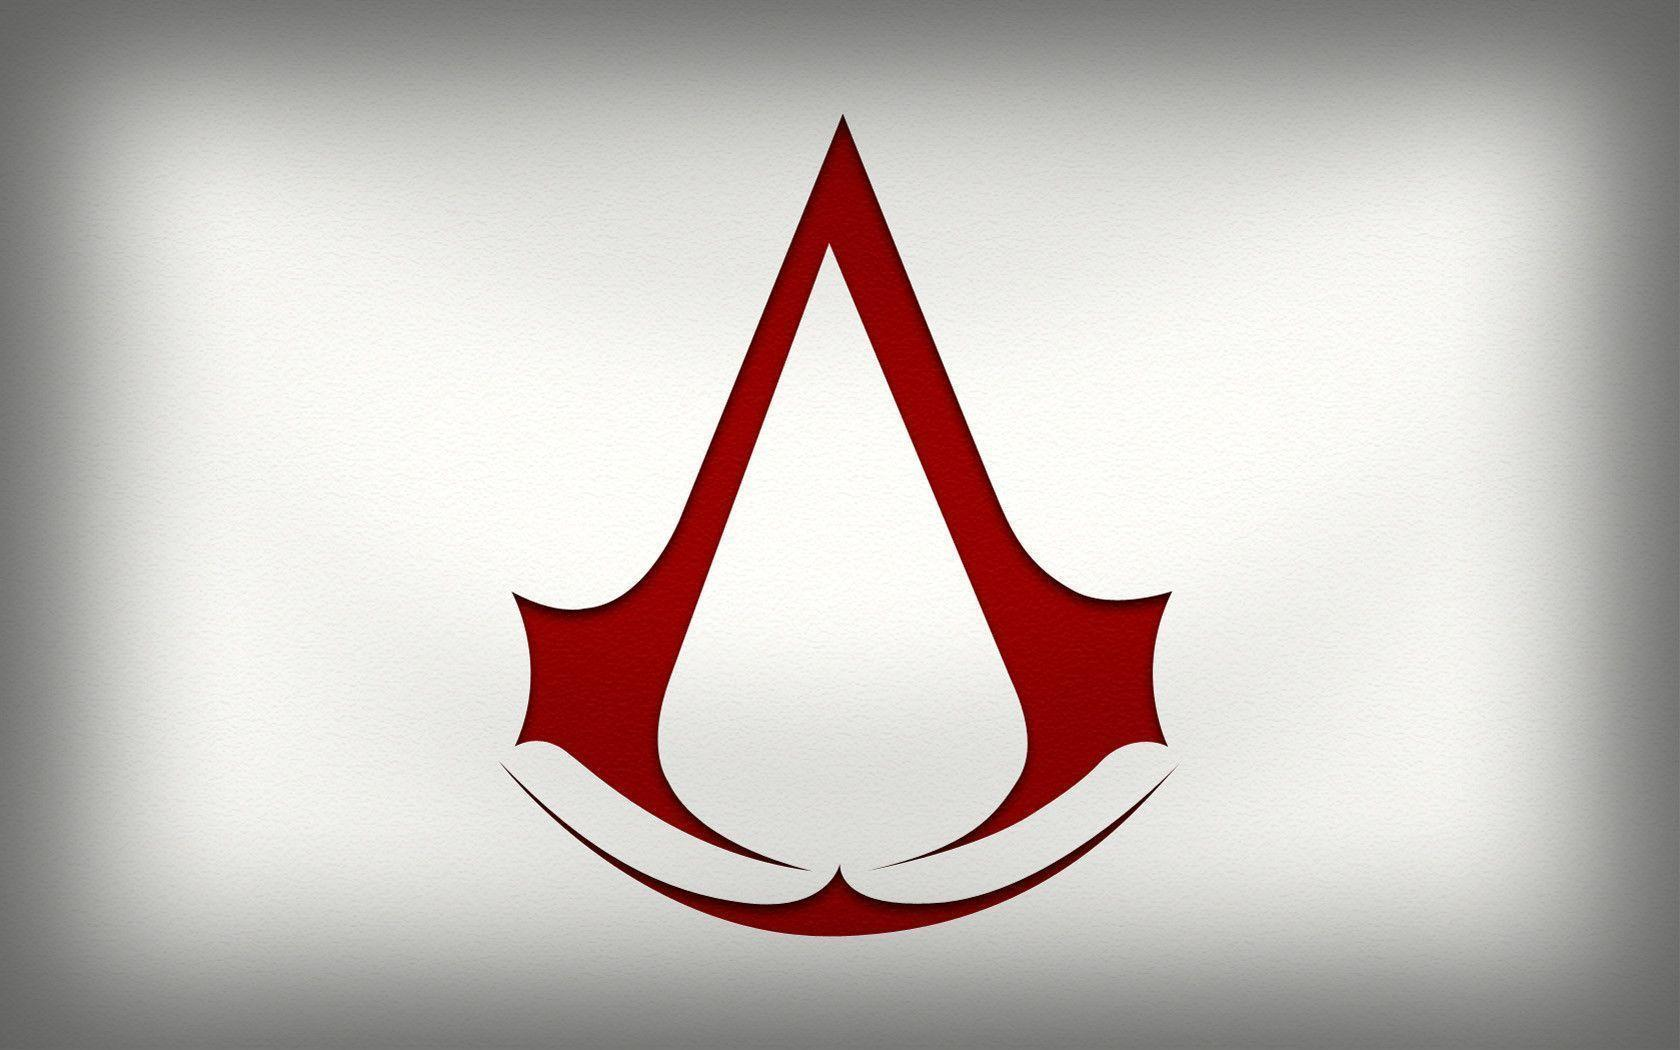 image logo assassin creed